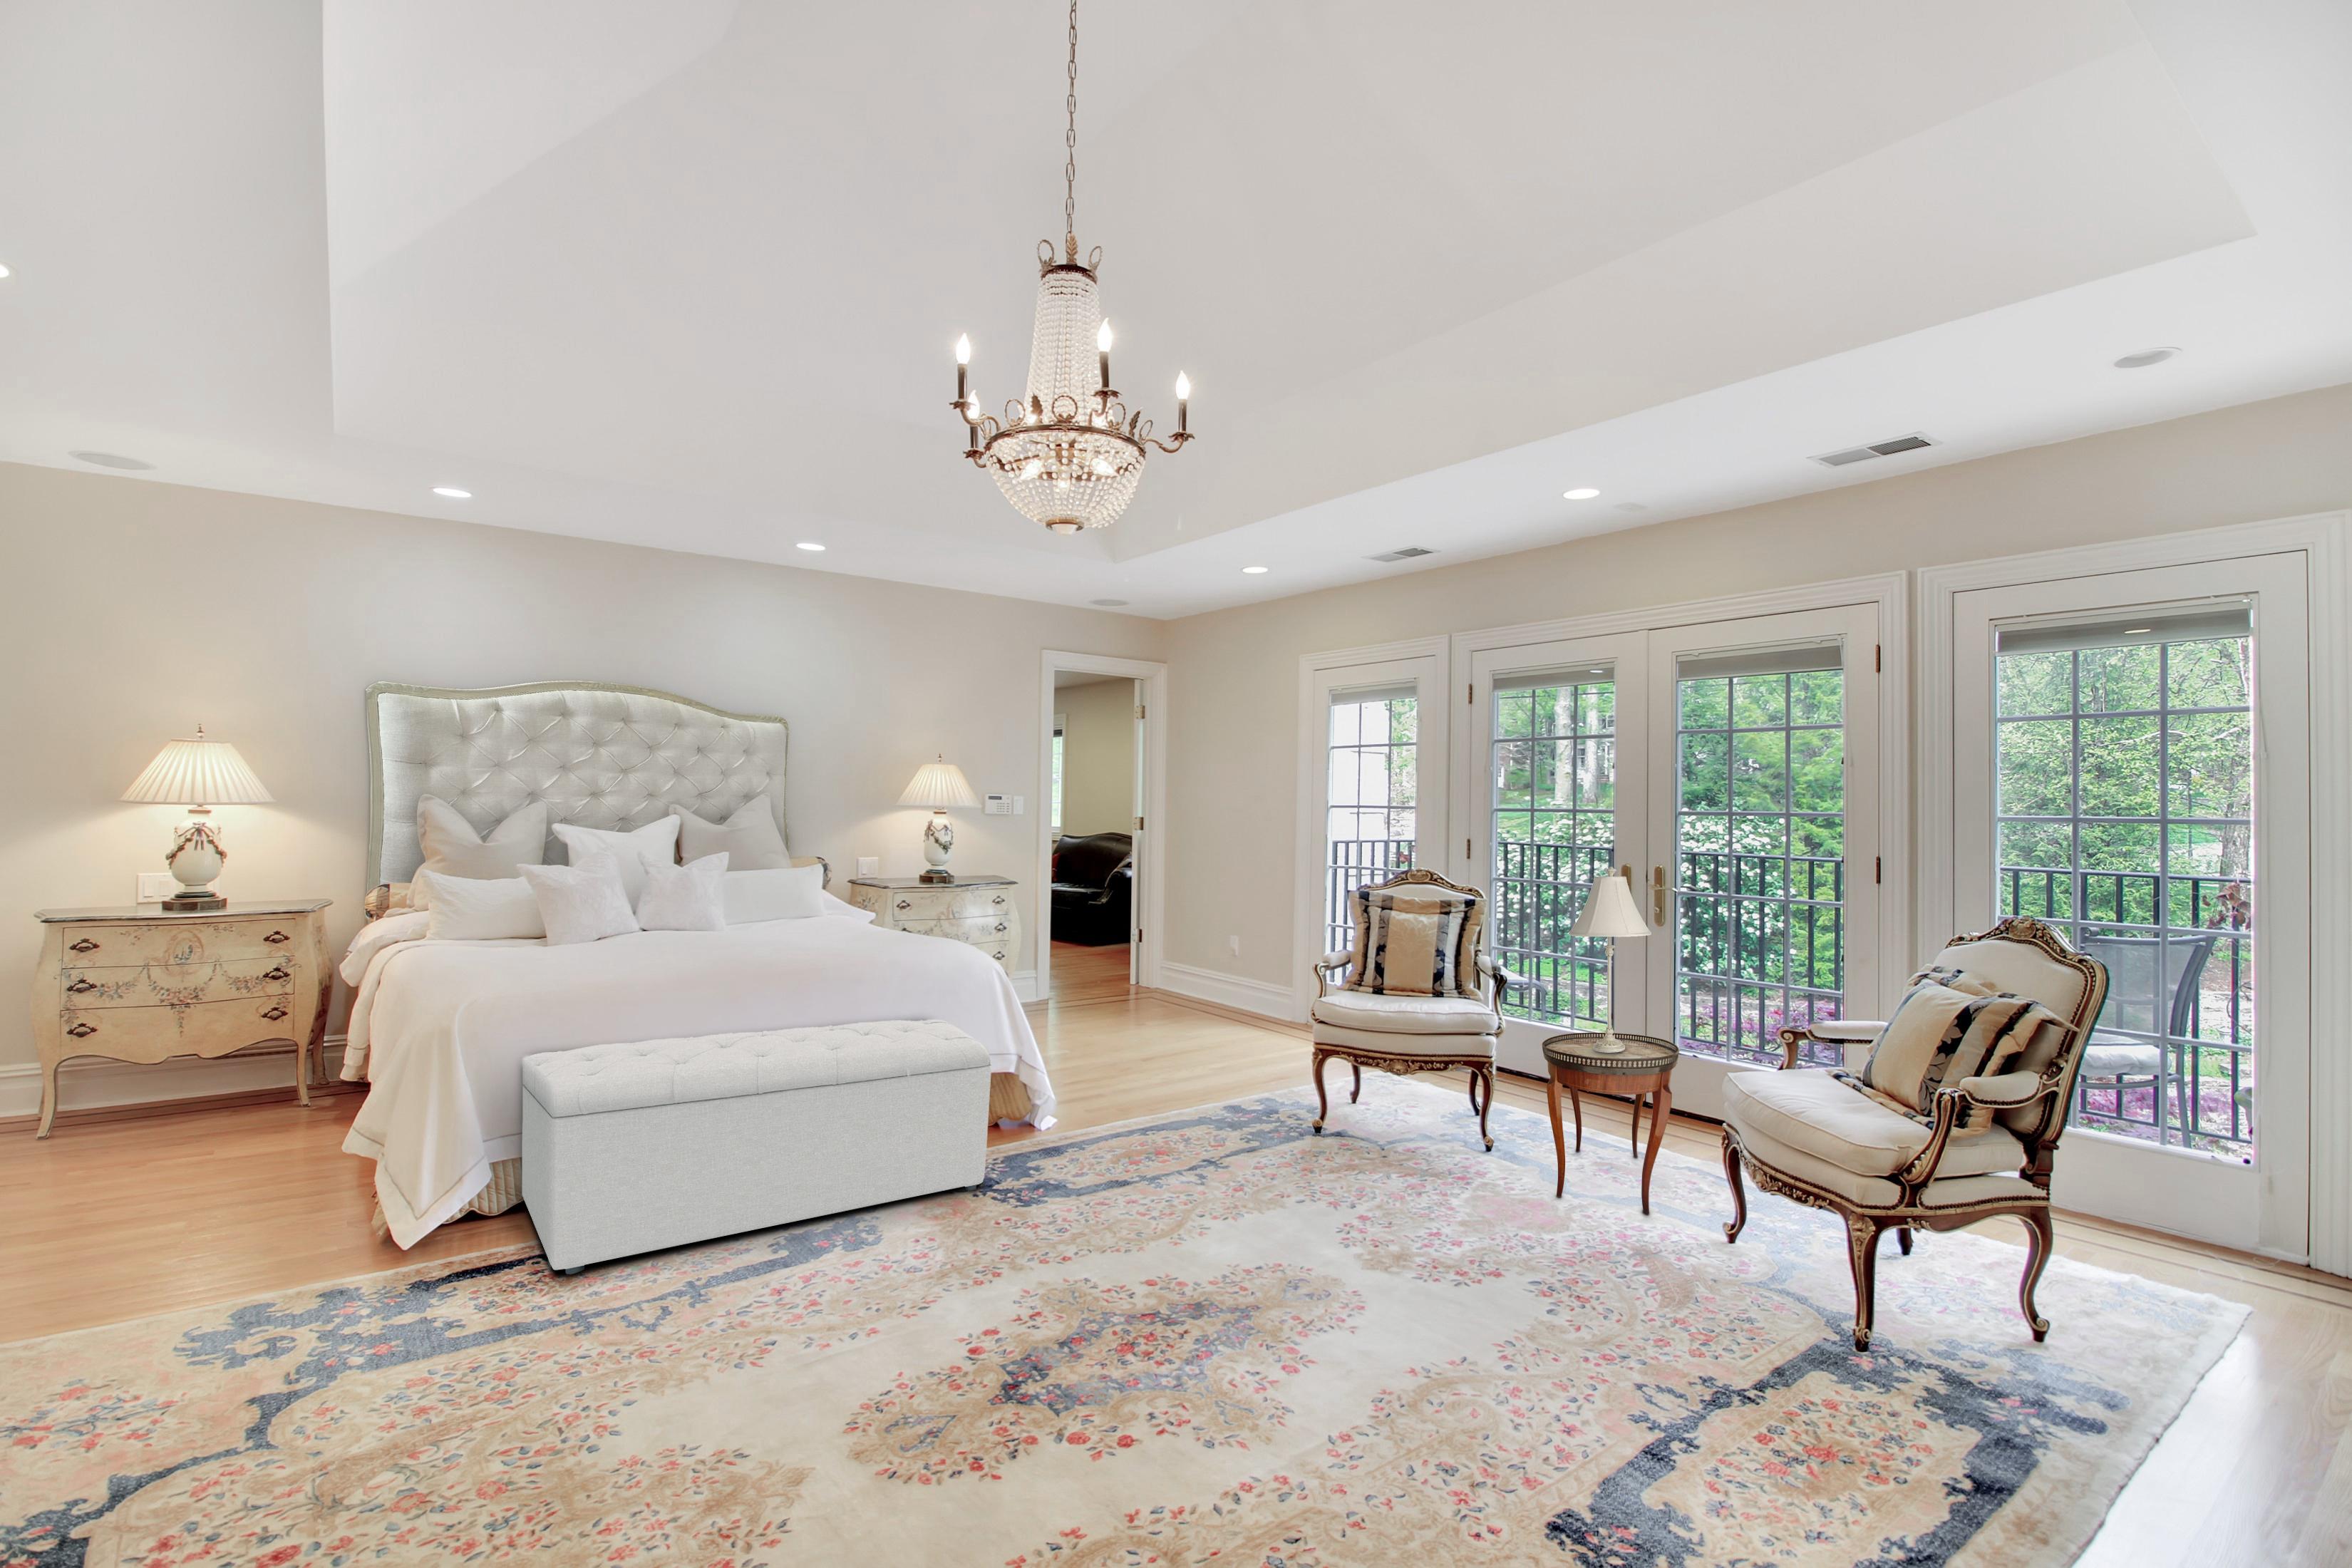 84 Shrewsbury Drive Master Suite